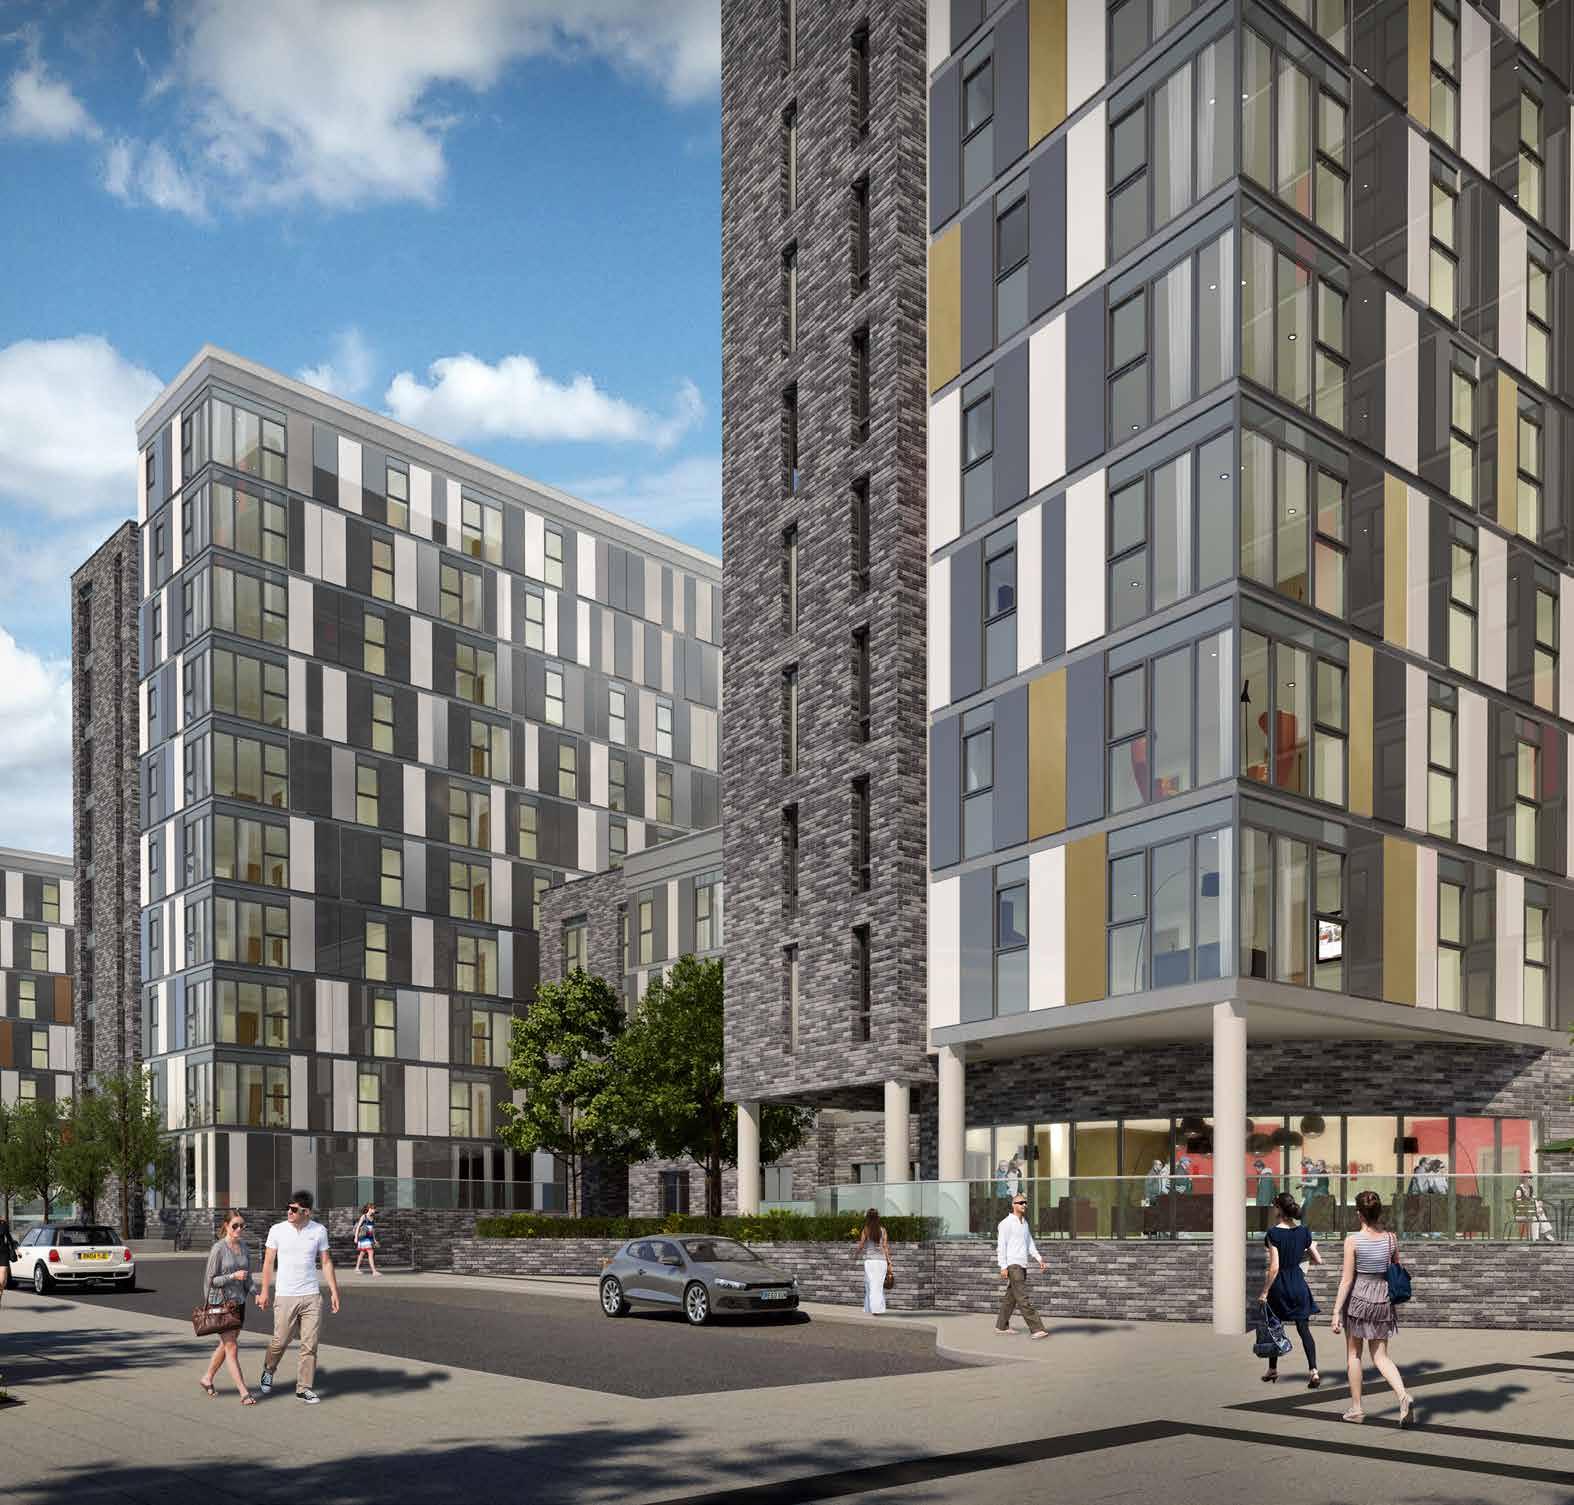 Downtown, Salford, M5 Thumbnail